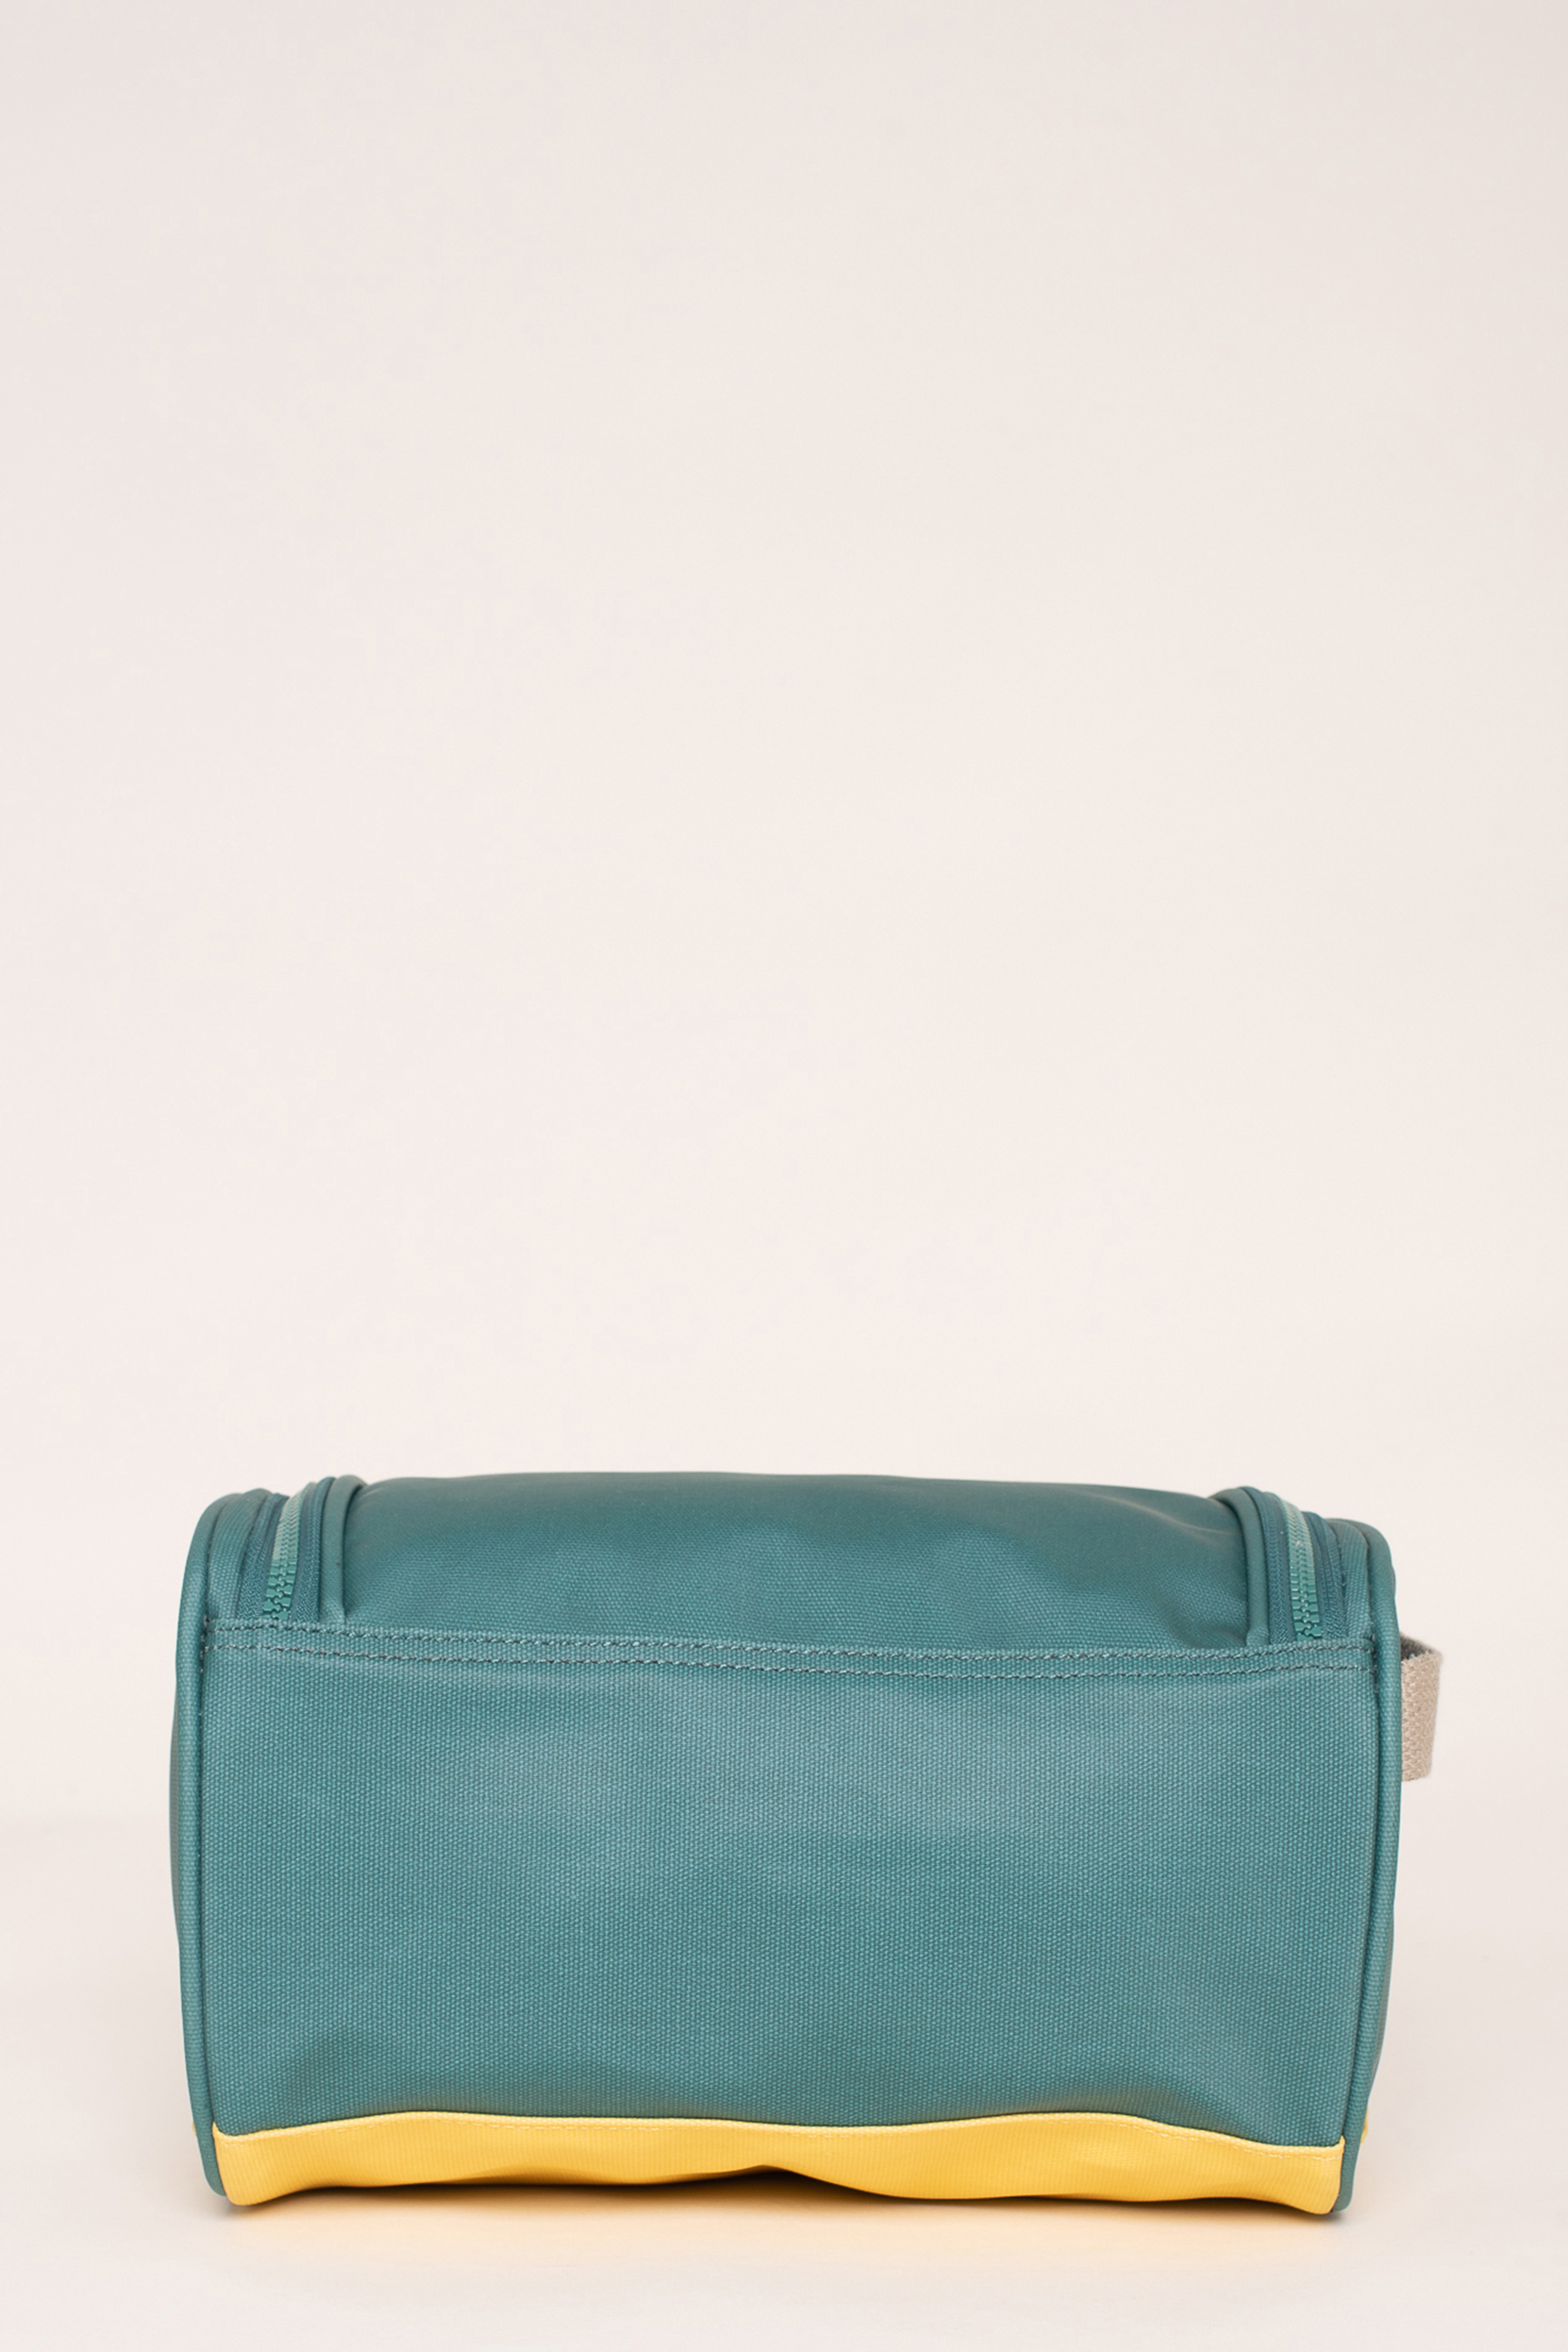 Brakeburn Green & Yellow Wash Bag